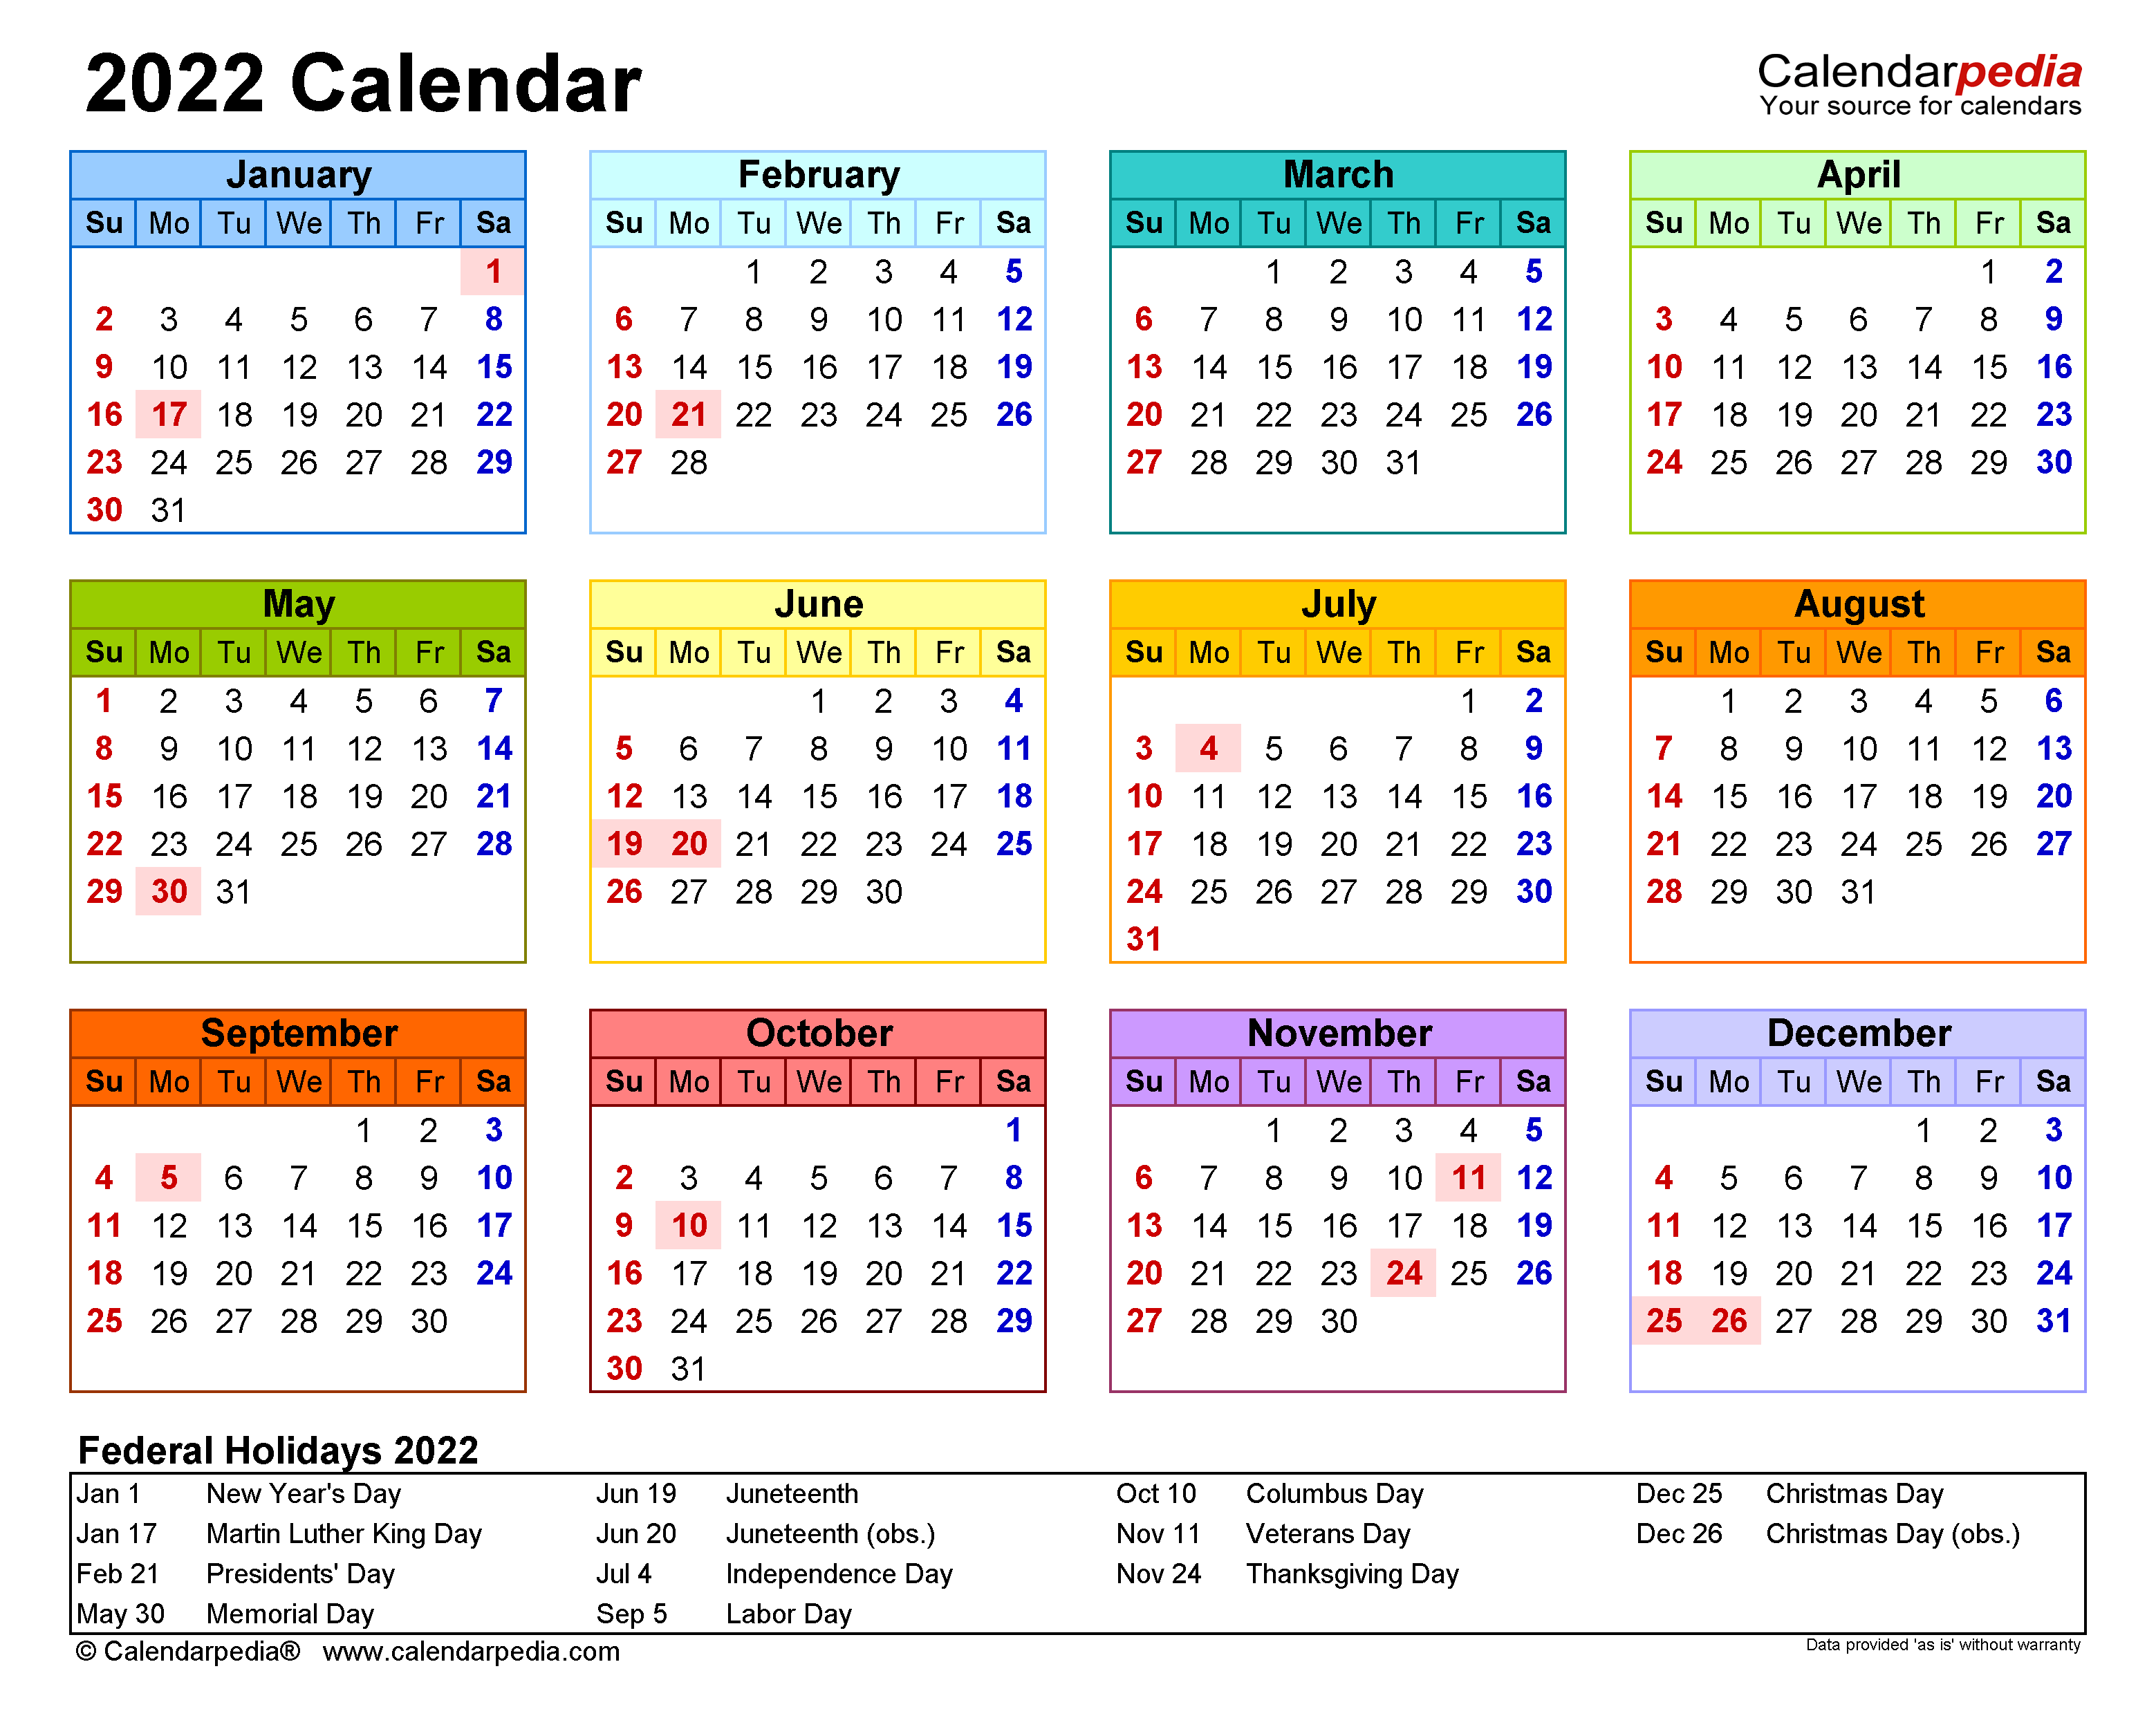 2022 Weekly Calendar Excel.2022 Calendar Free Printable Excel Templates Calendarpedia